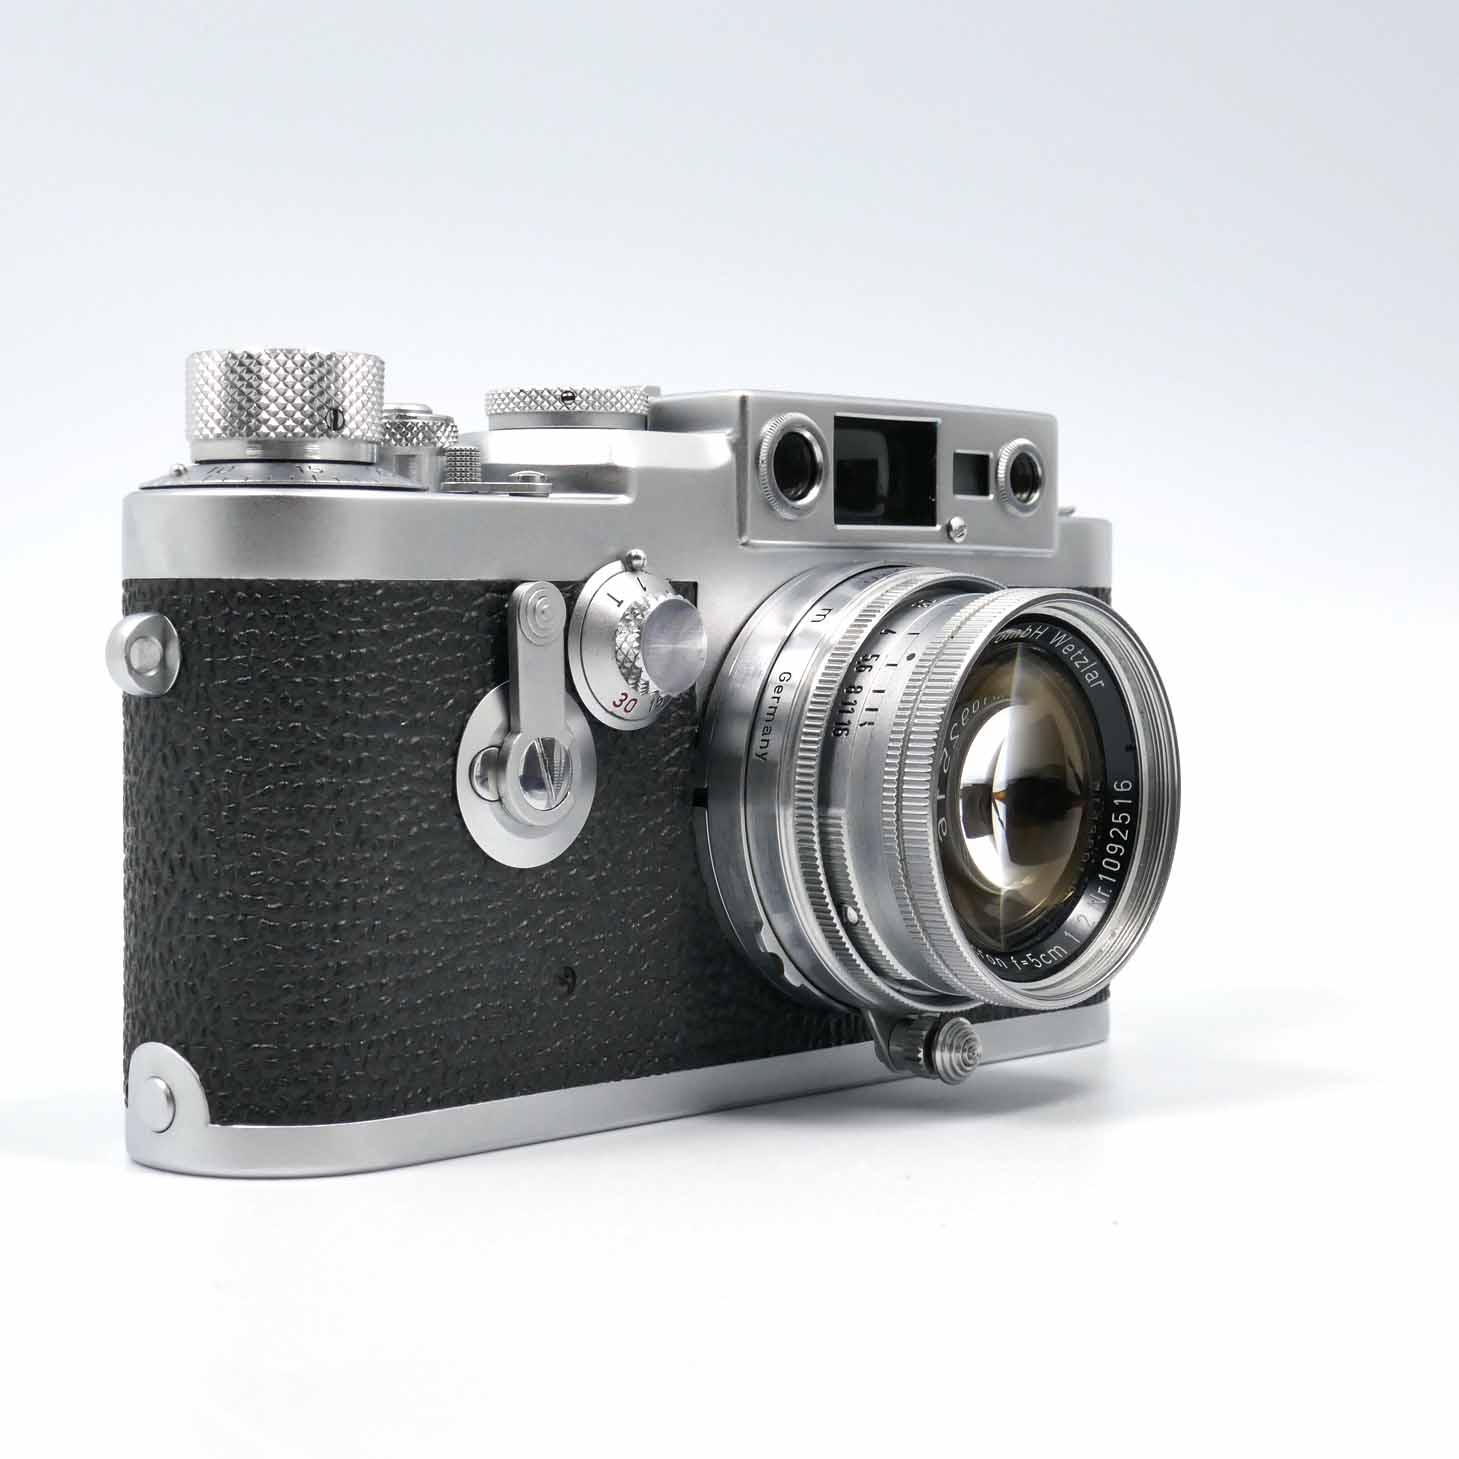 clean-cameras-Leica-IIIg+Summicron-2.0-5cm19